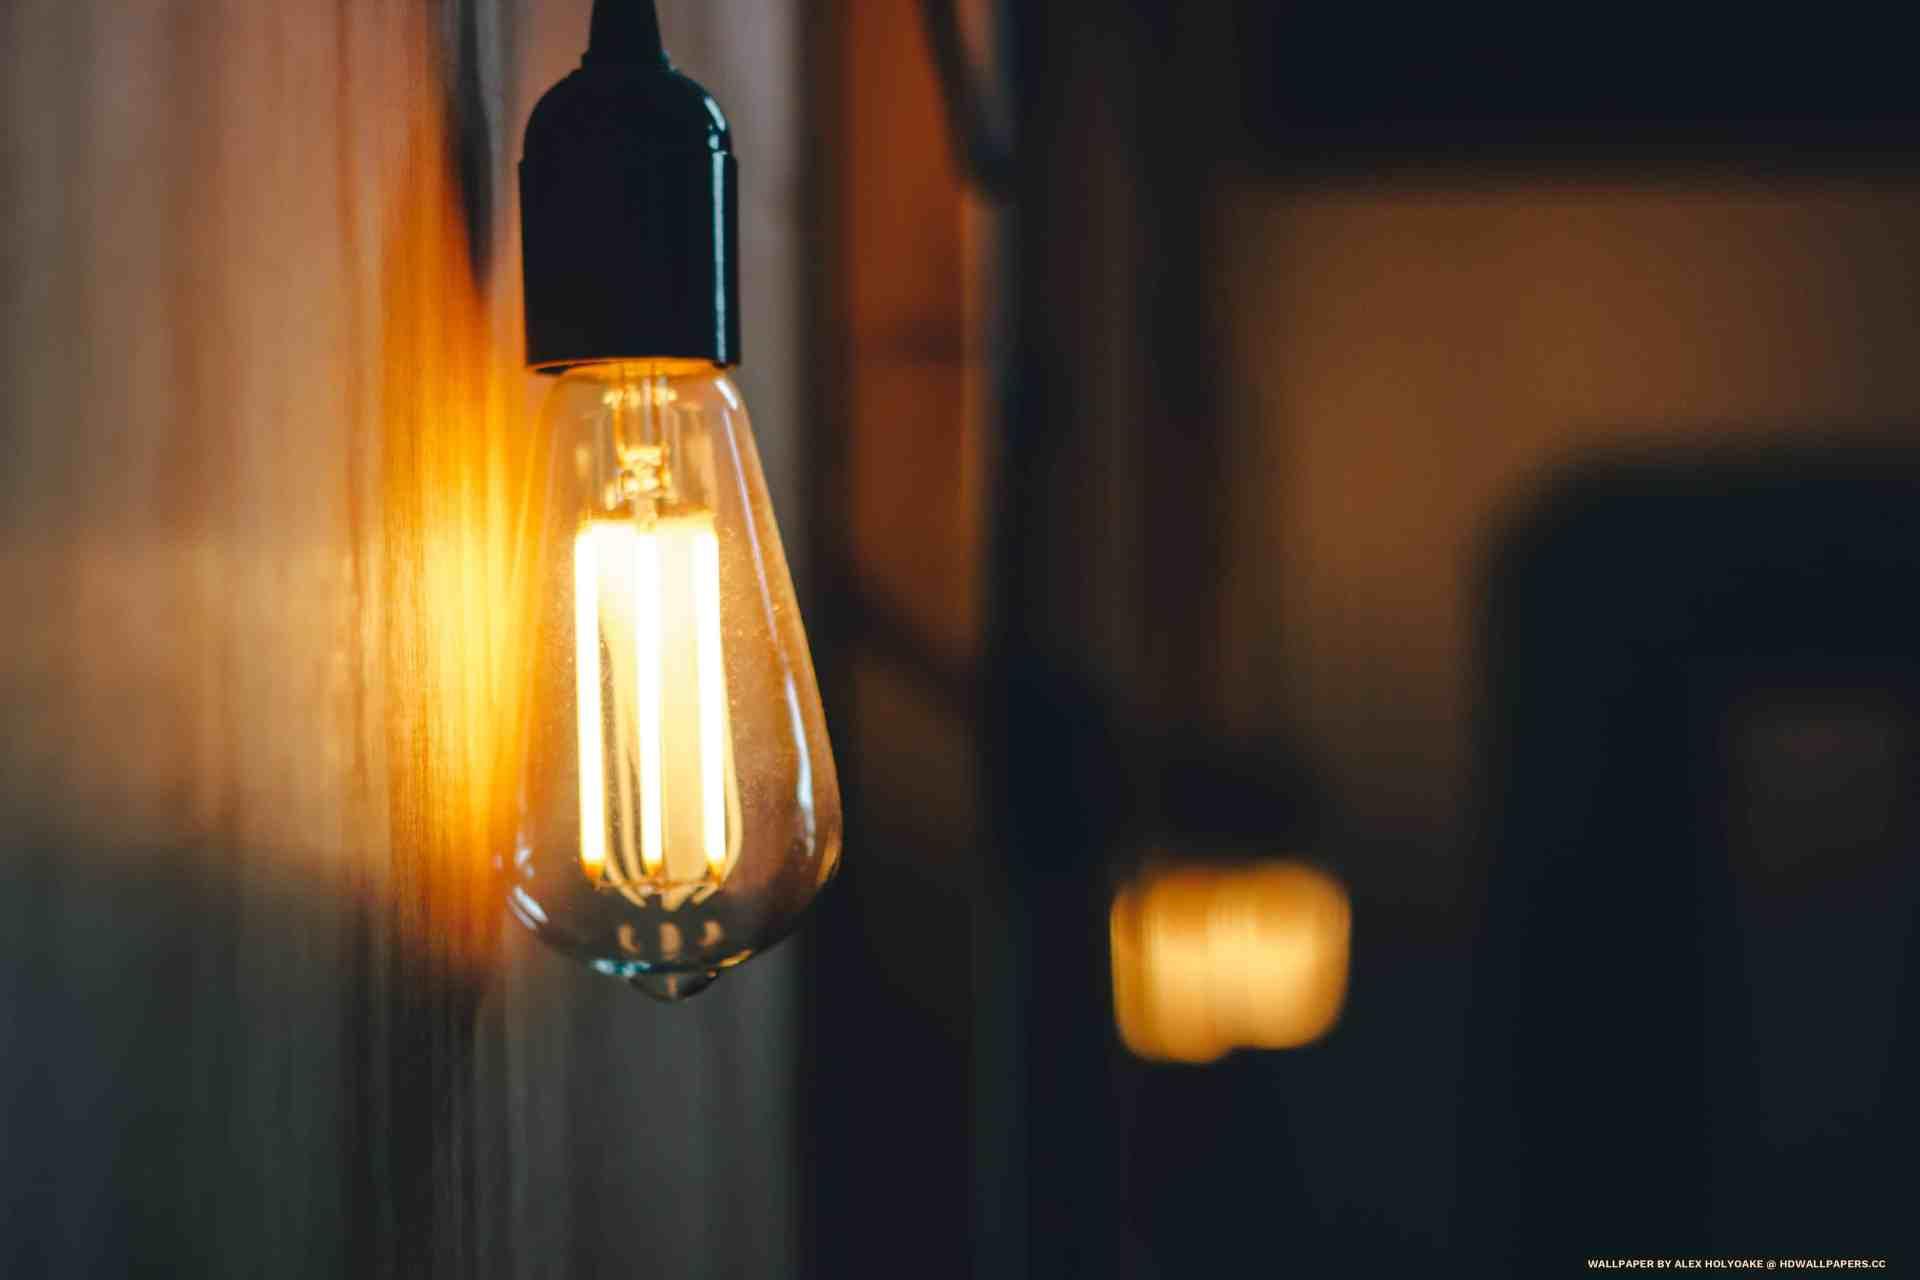 Lights 1 Hd Wallpapers